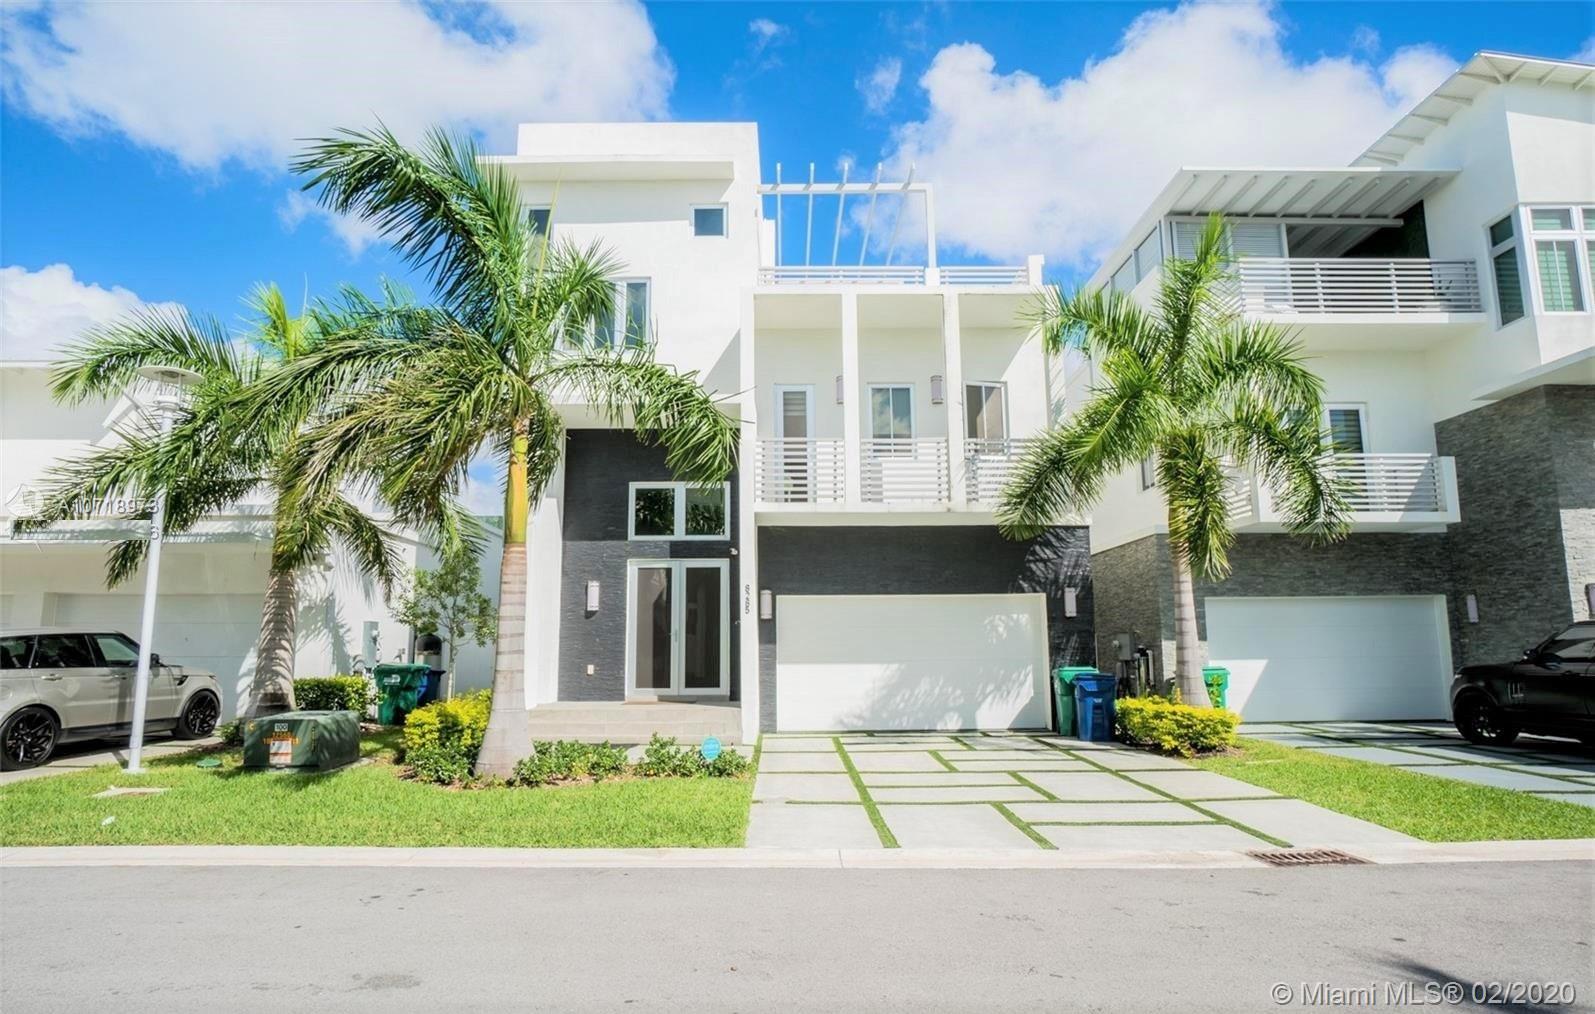 8285 NW 34 Dr, Doral, Florida